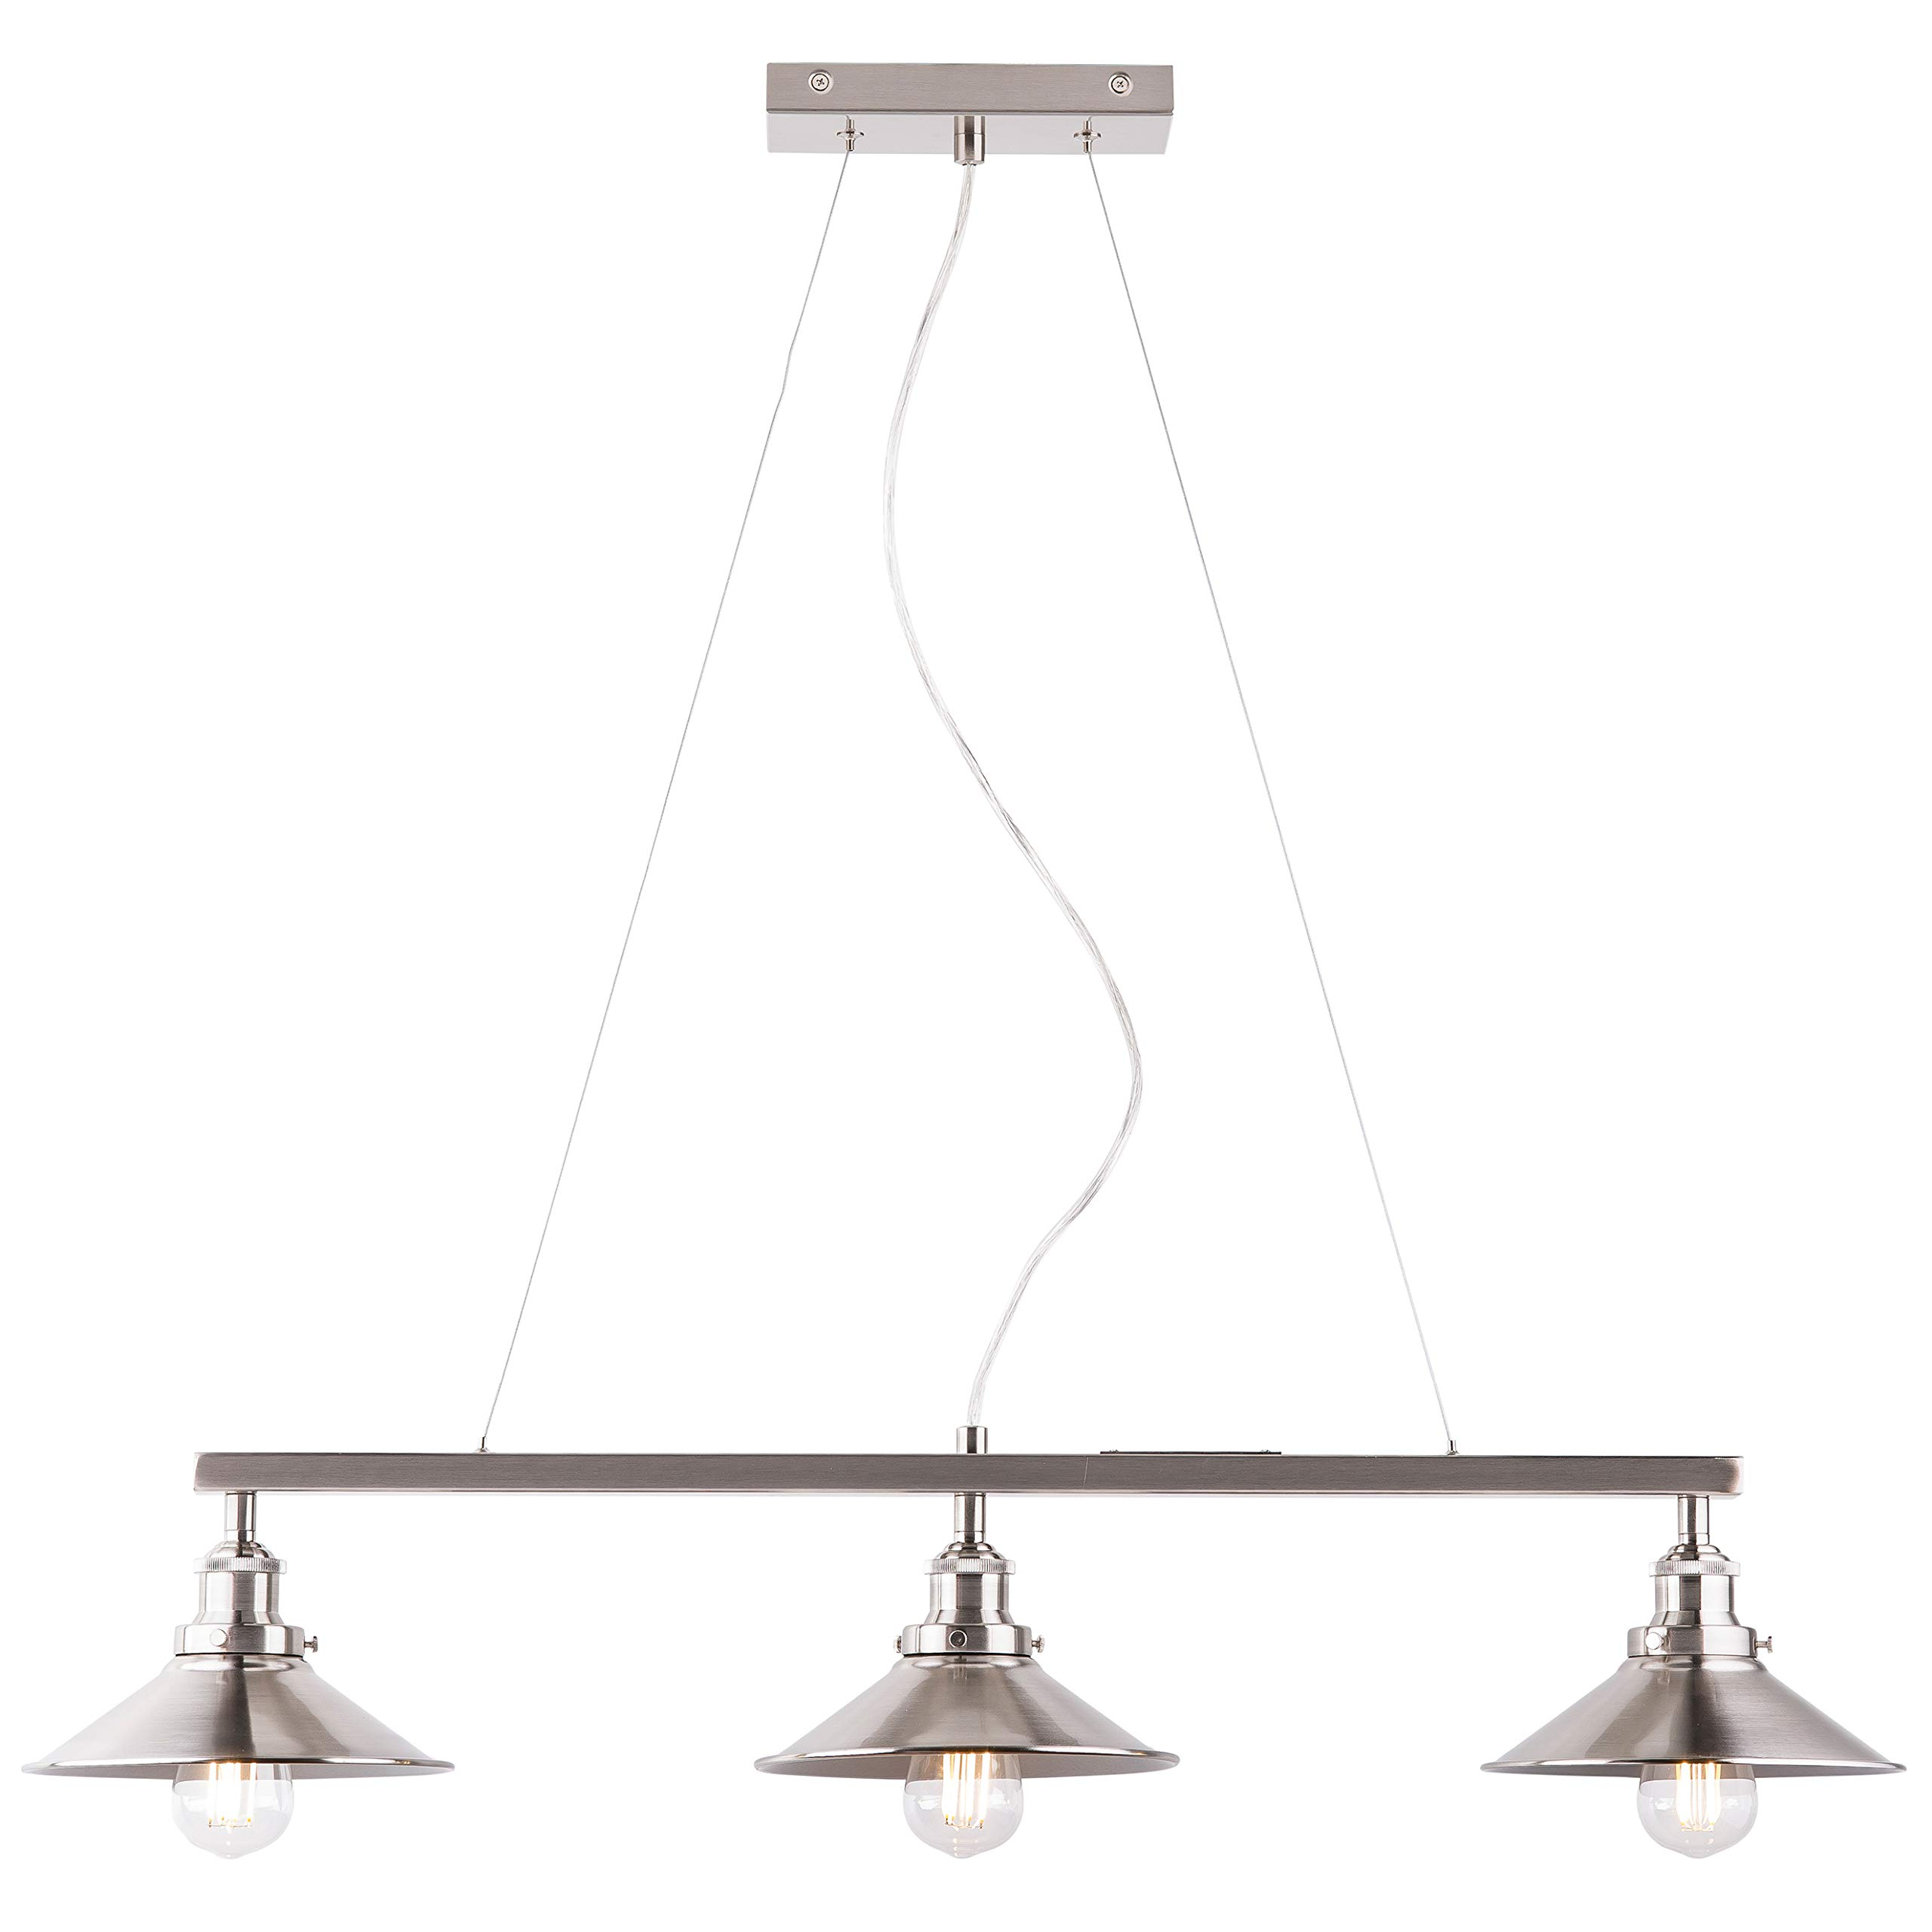 Andante 3 Light Kitchen Island Light Fixture, Brushed Nickel, Linea di Liara LL-P347-BN